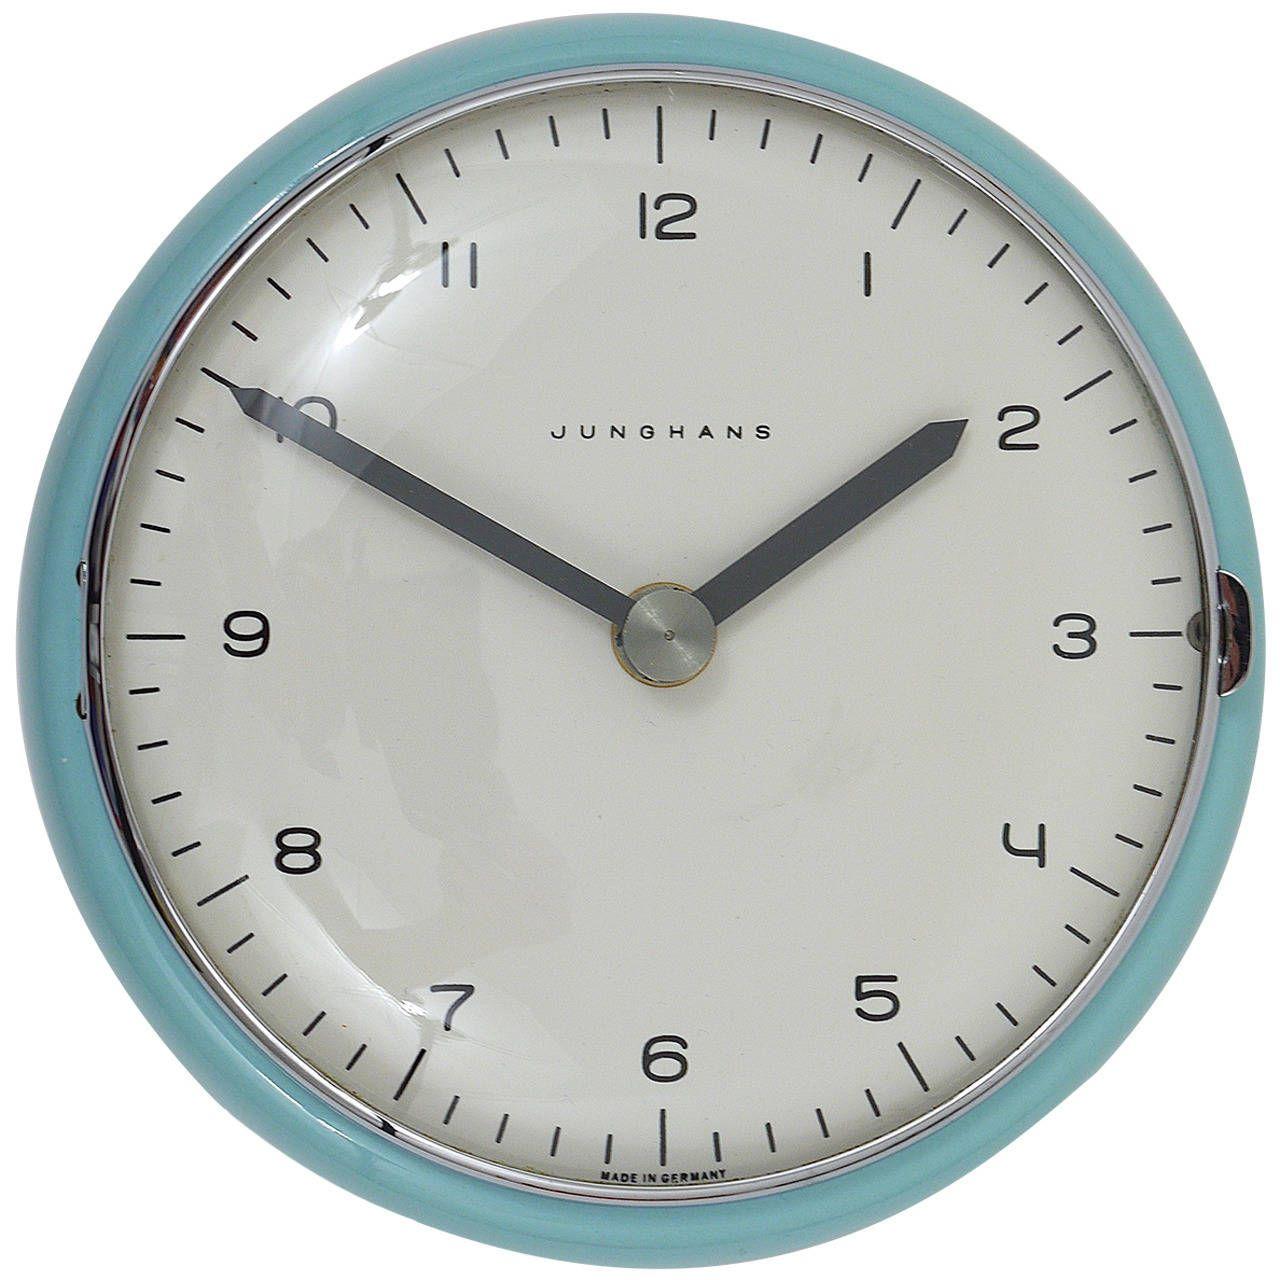 Rare round max bill modernist wall clock by junghans germany rare round max bill modernist wall clock by junghans germany 1950s amipublicfo Images